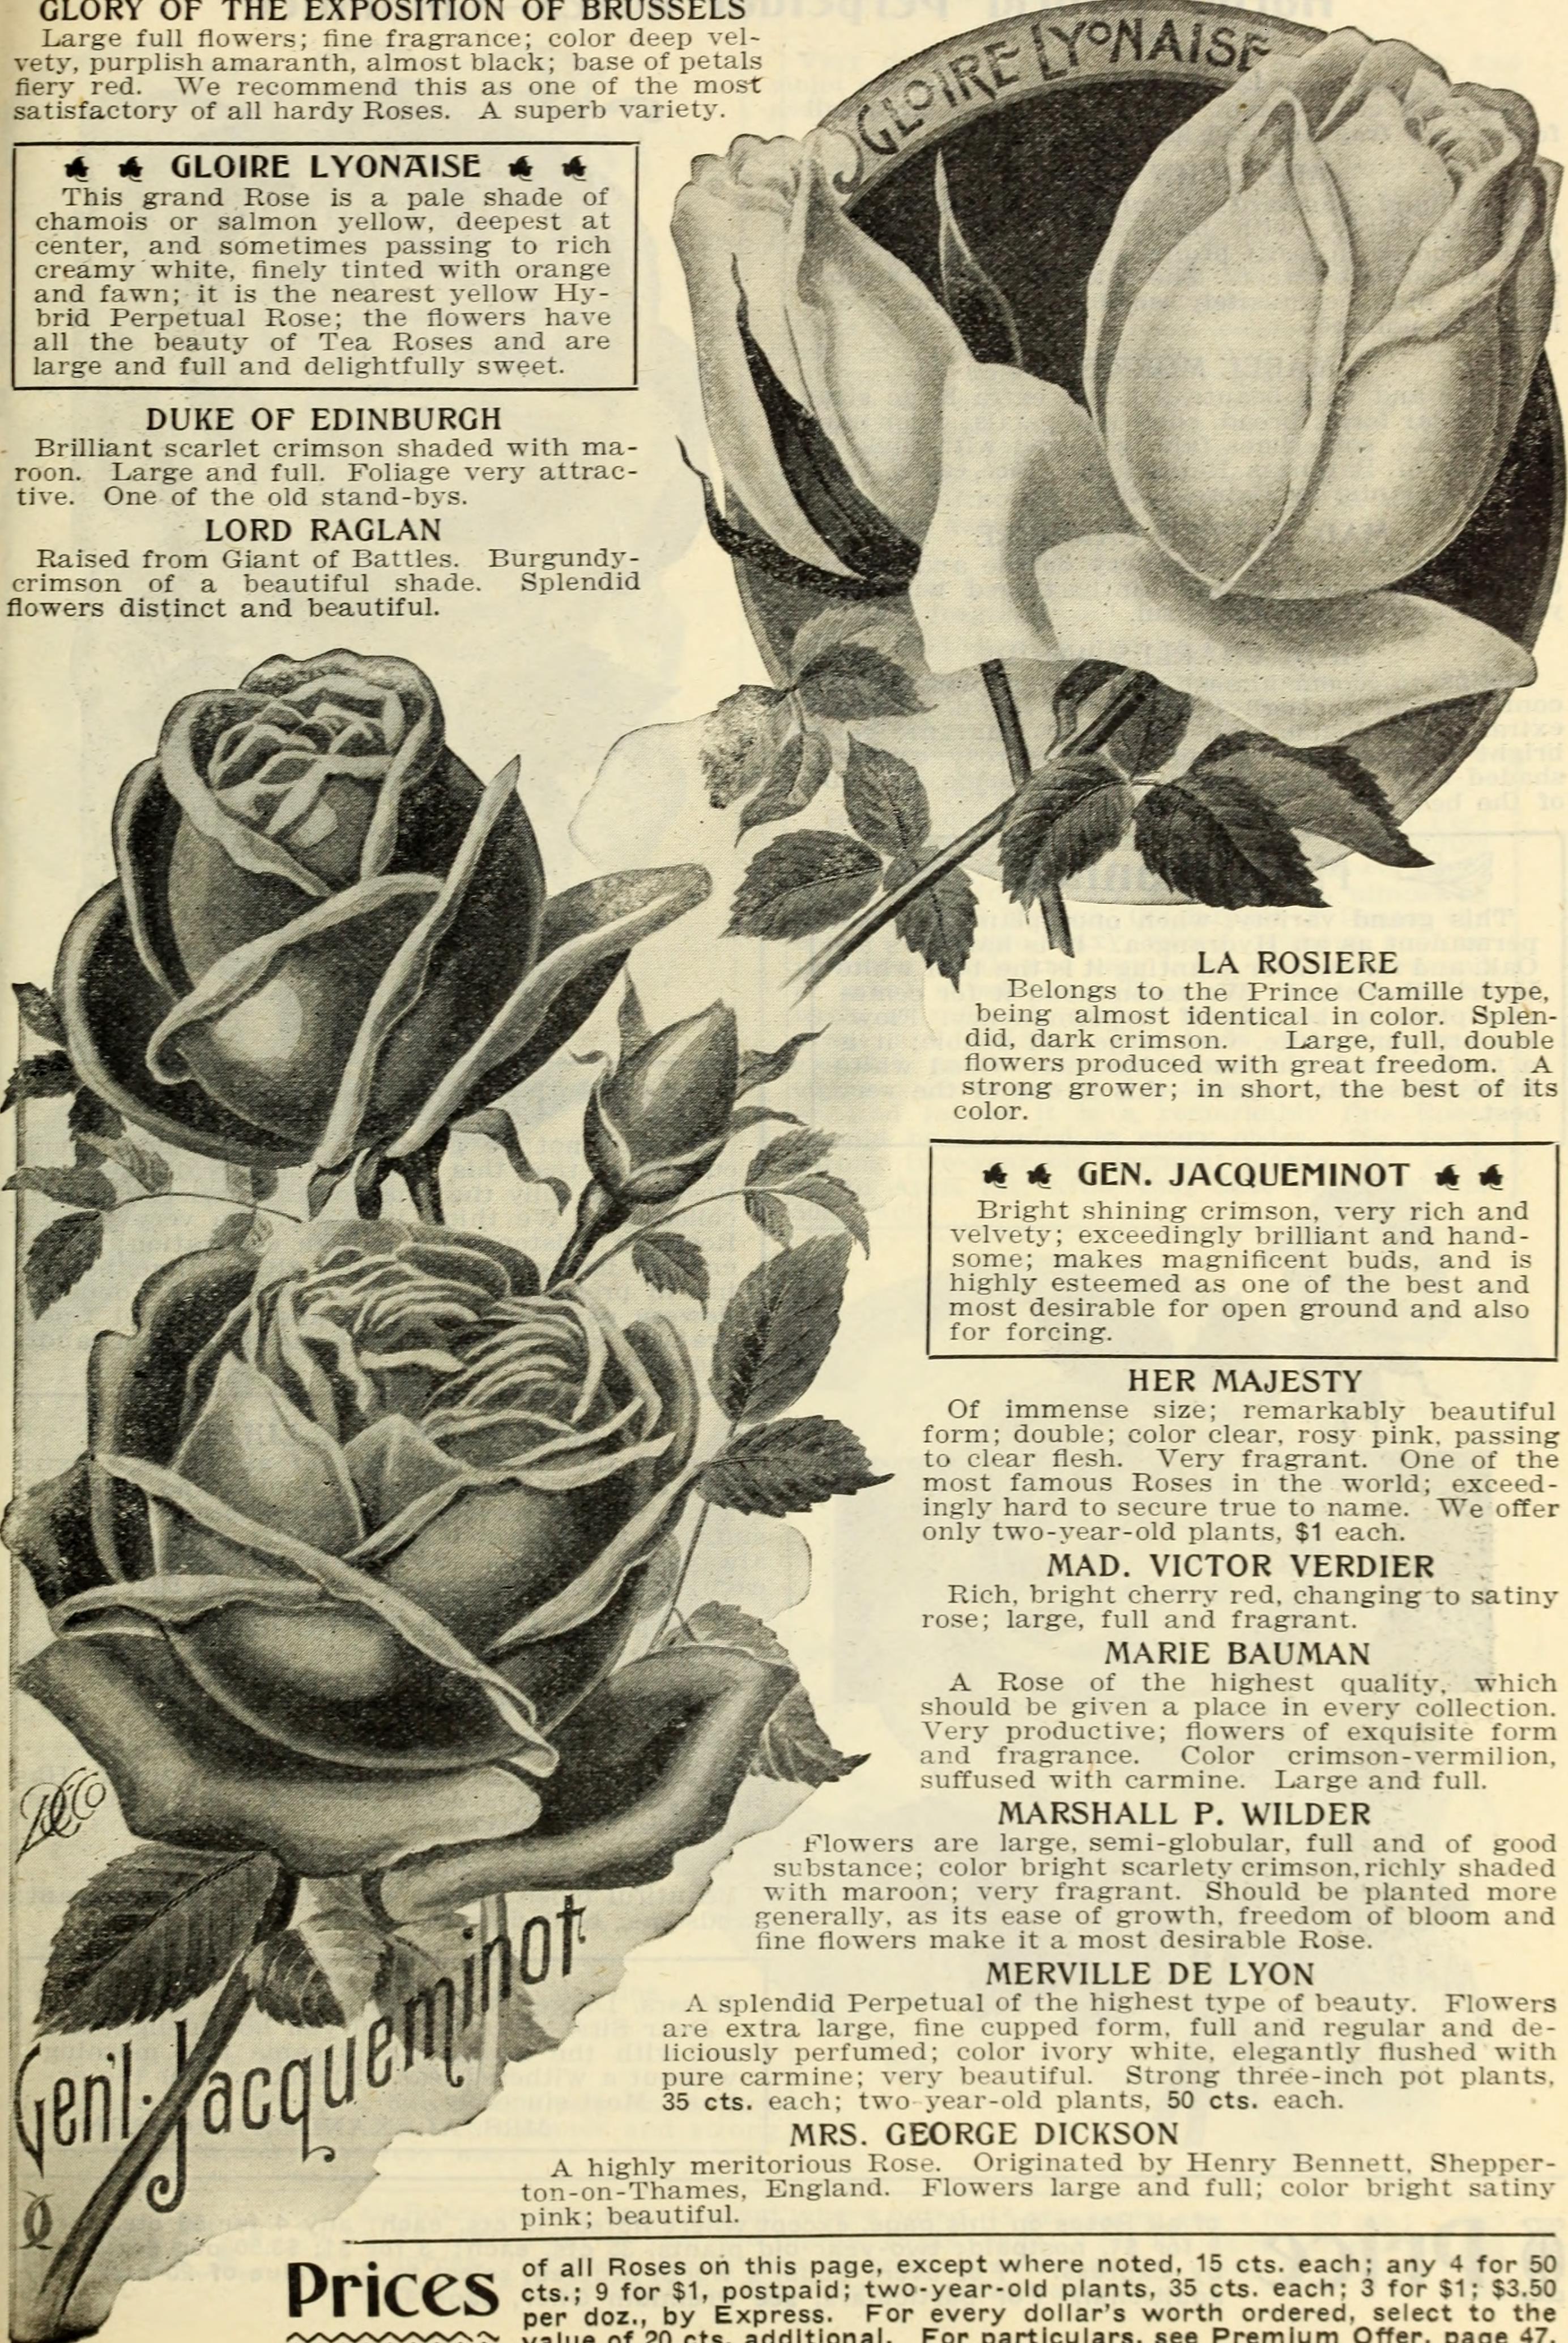 Fileour new guide to rose culture 1906 1906 14780054032g fileour new guide to rose culture 1906 1906 14780054032 izmirmasajfo